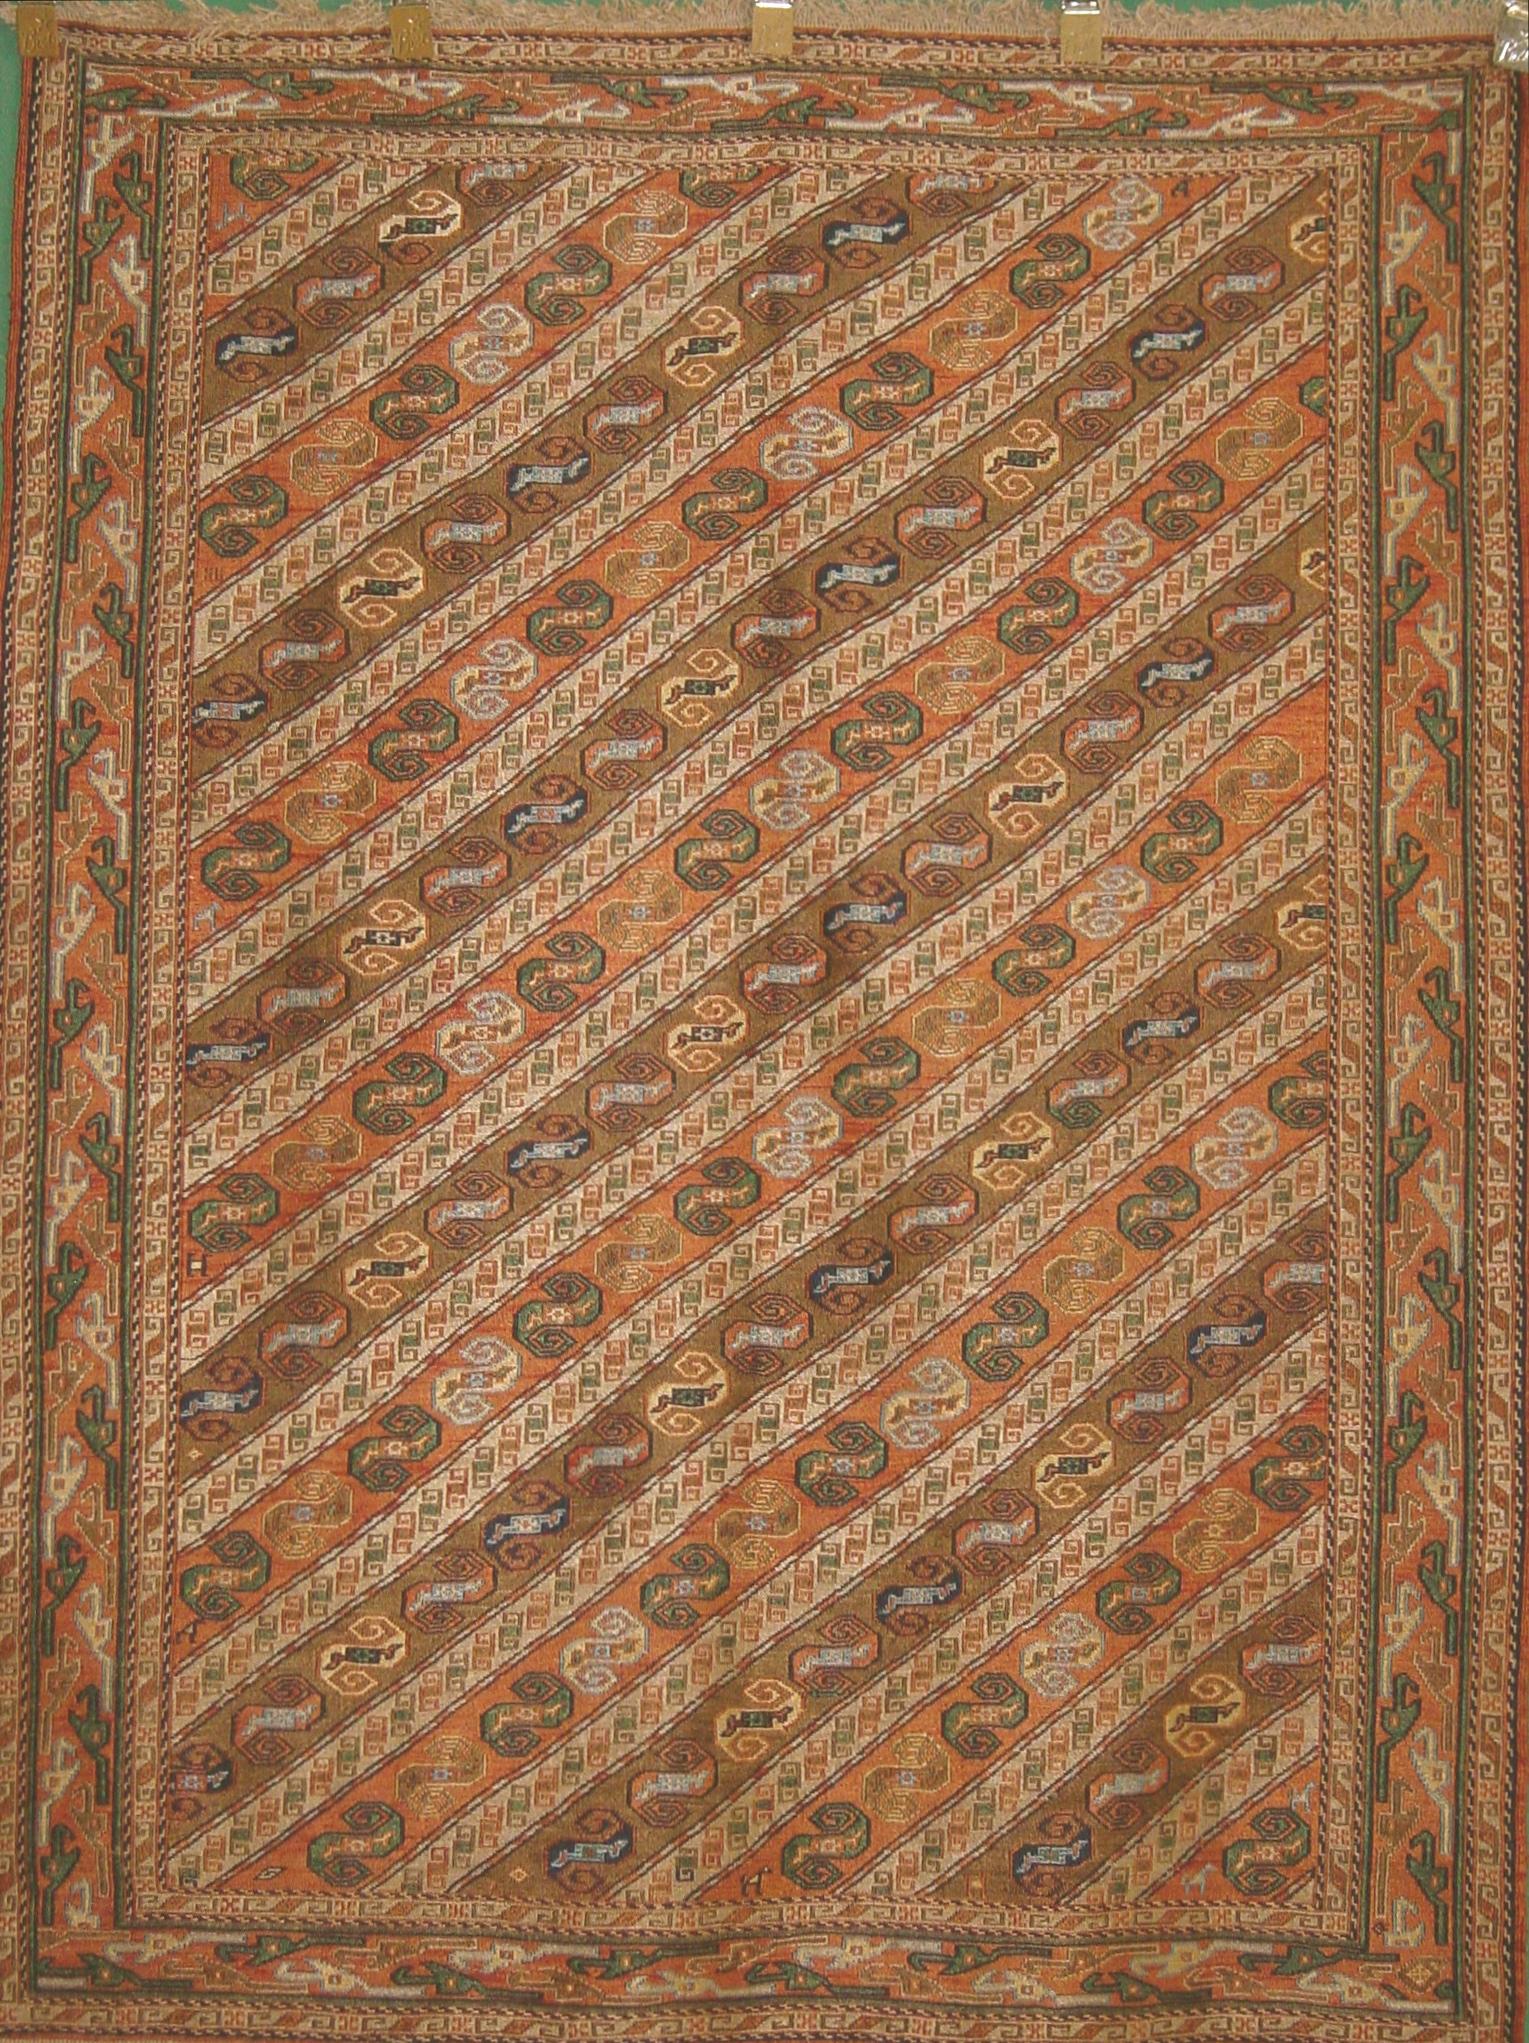 216 Shahsavan Ulmaz, Persia, Silk Embroidery, 3'11''x5'3''